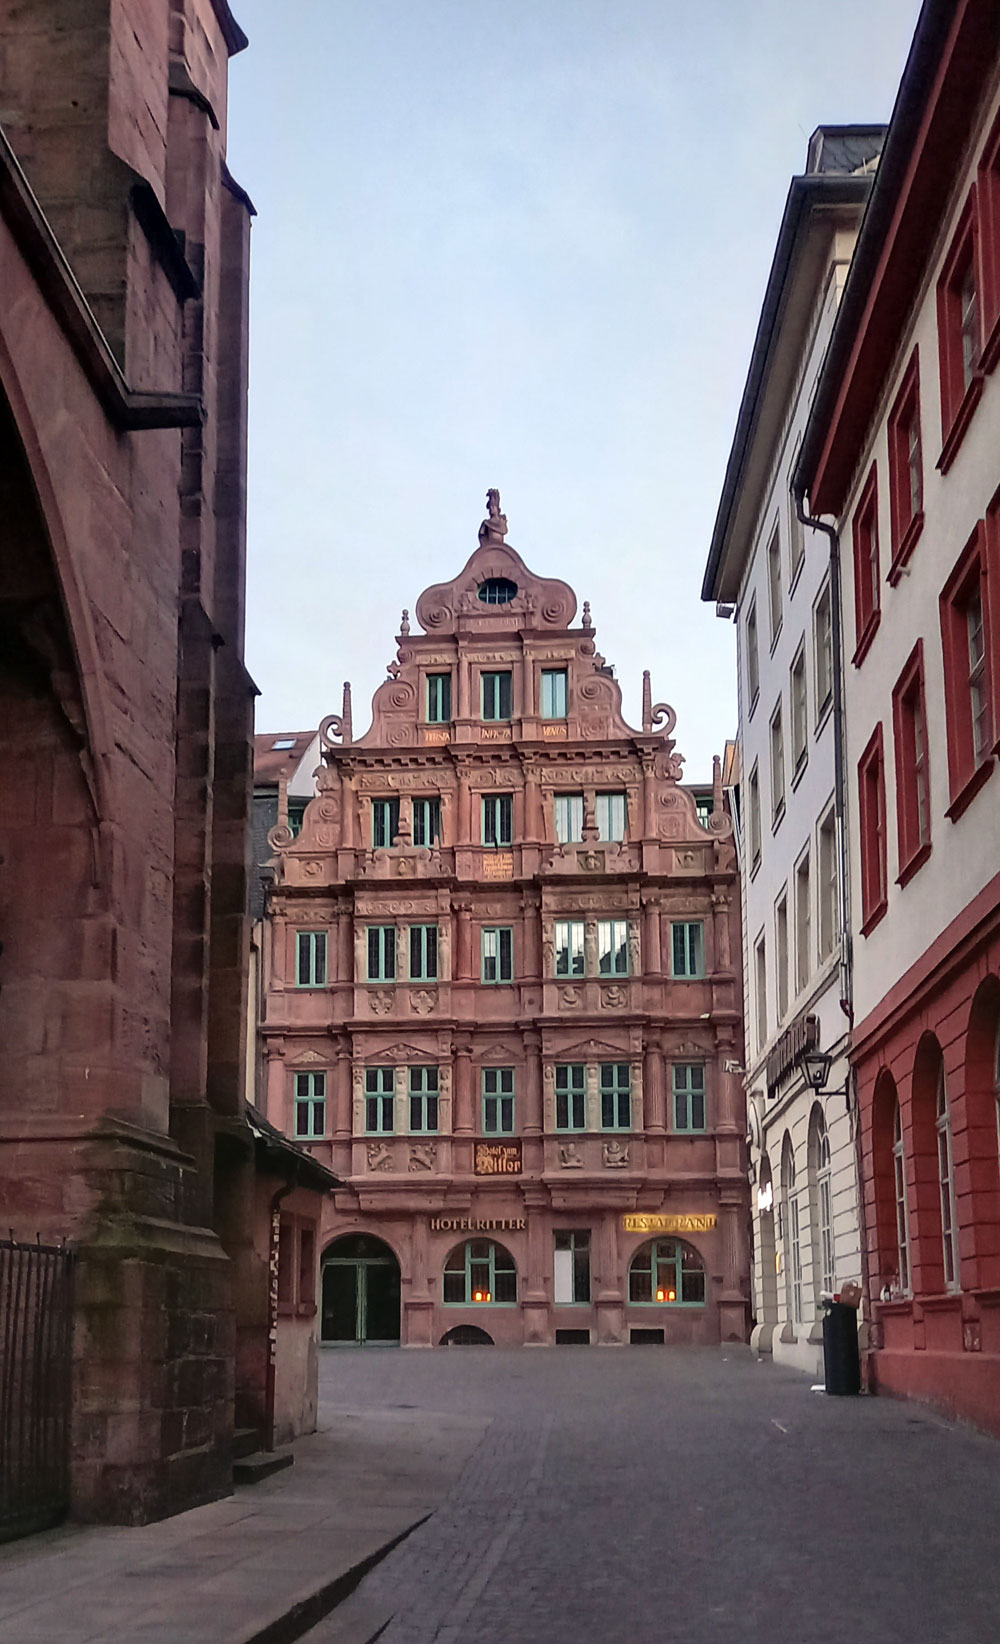 Hotel Ritter in der Heidelberger Altstadt